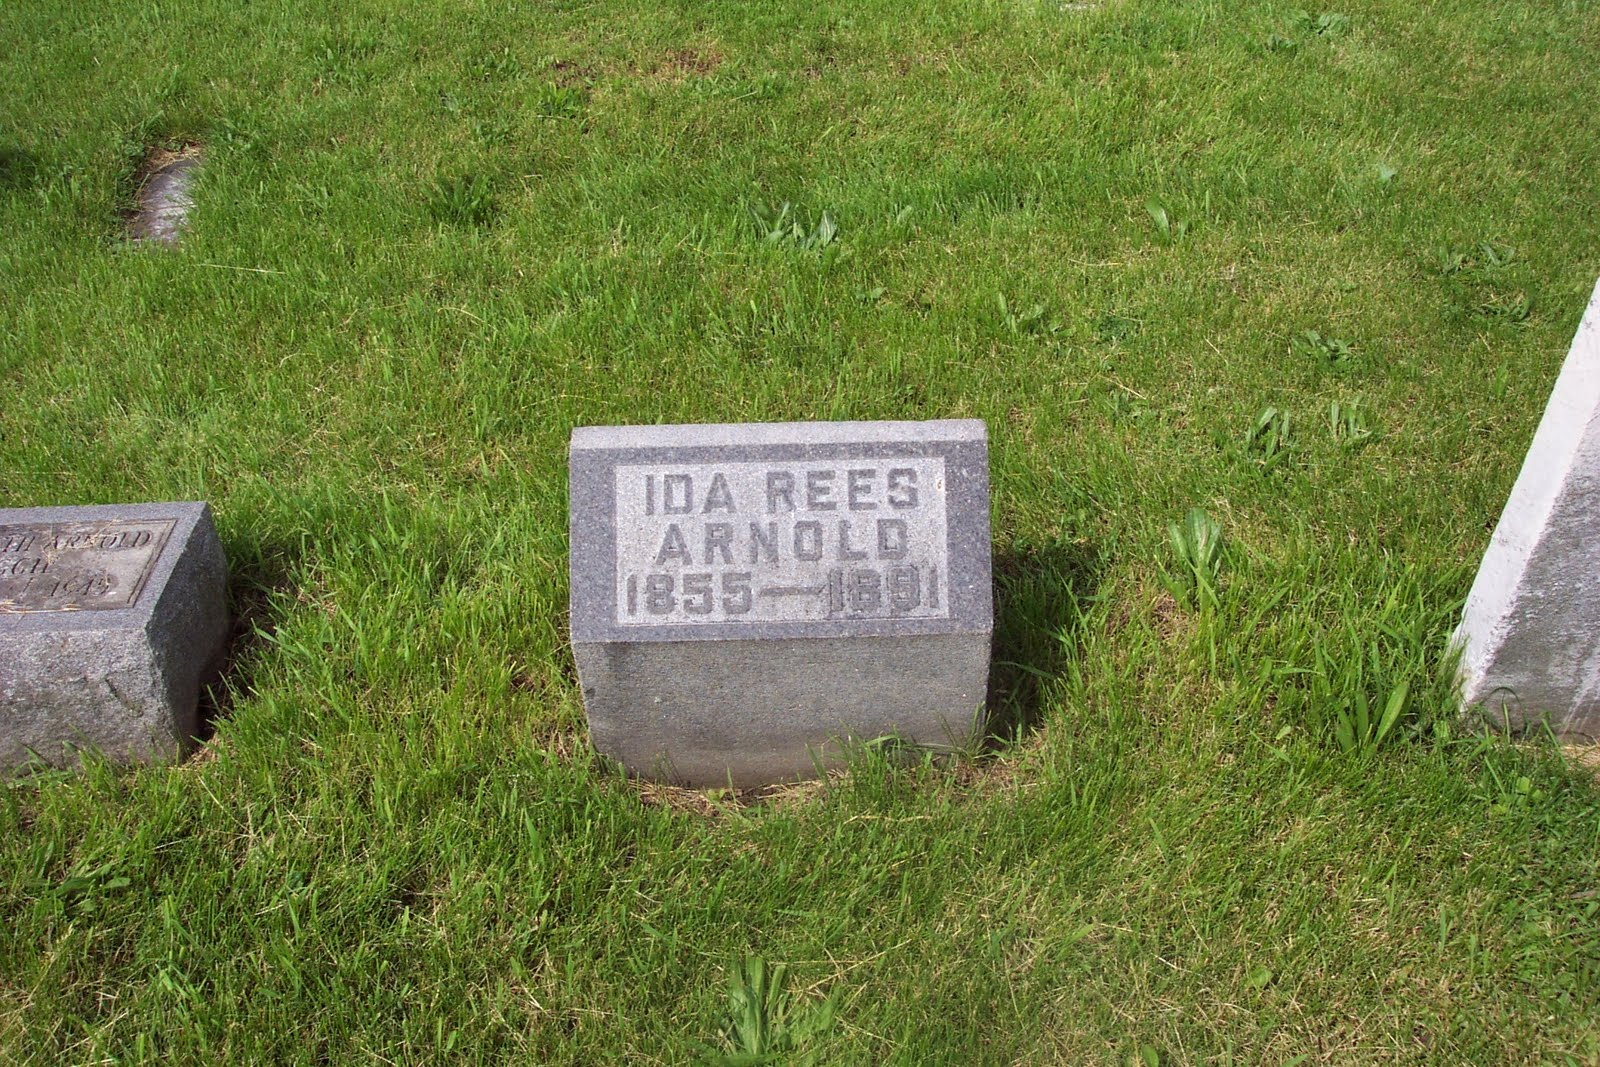 http://1.bp.blogspot.com/_JkmdFBxf1PA/S8PZFiUlSMI/AAAAAAAAAHU/Sl0WtZyGZRE/s1600/tombstone.IdaReesArnold.JPG